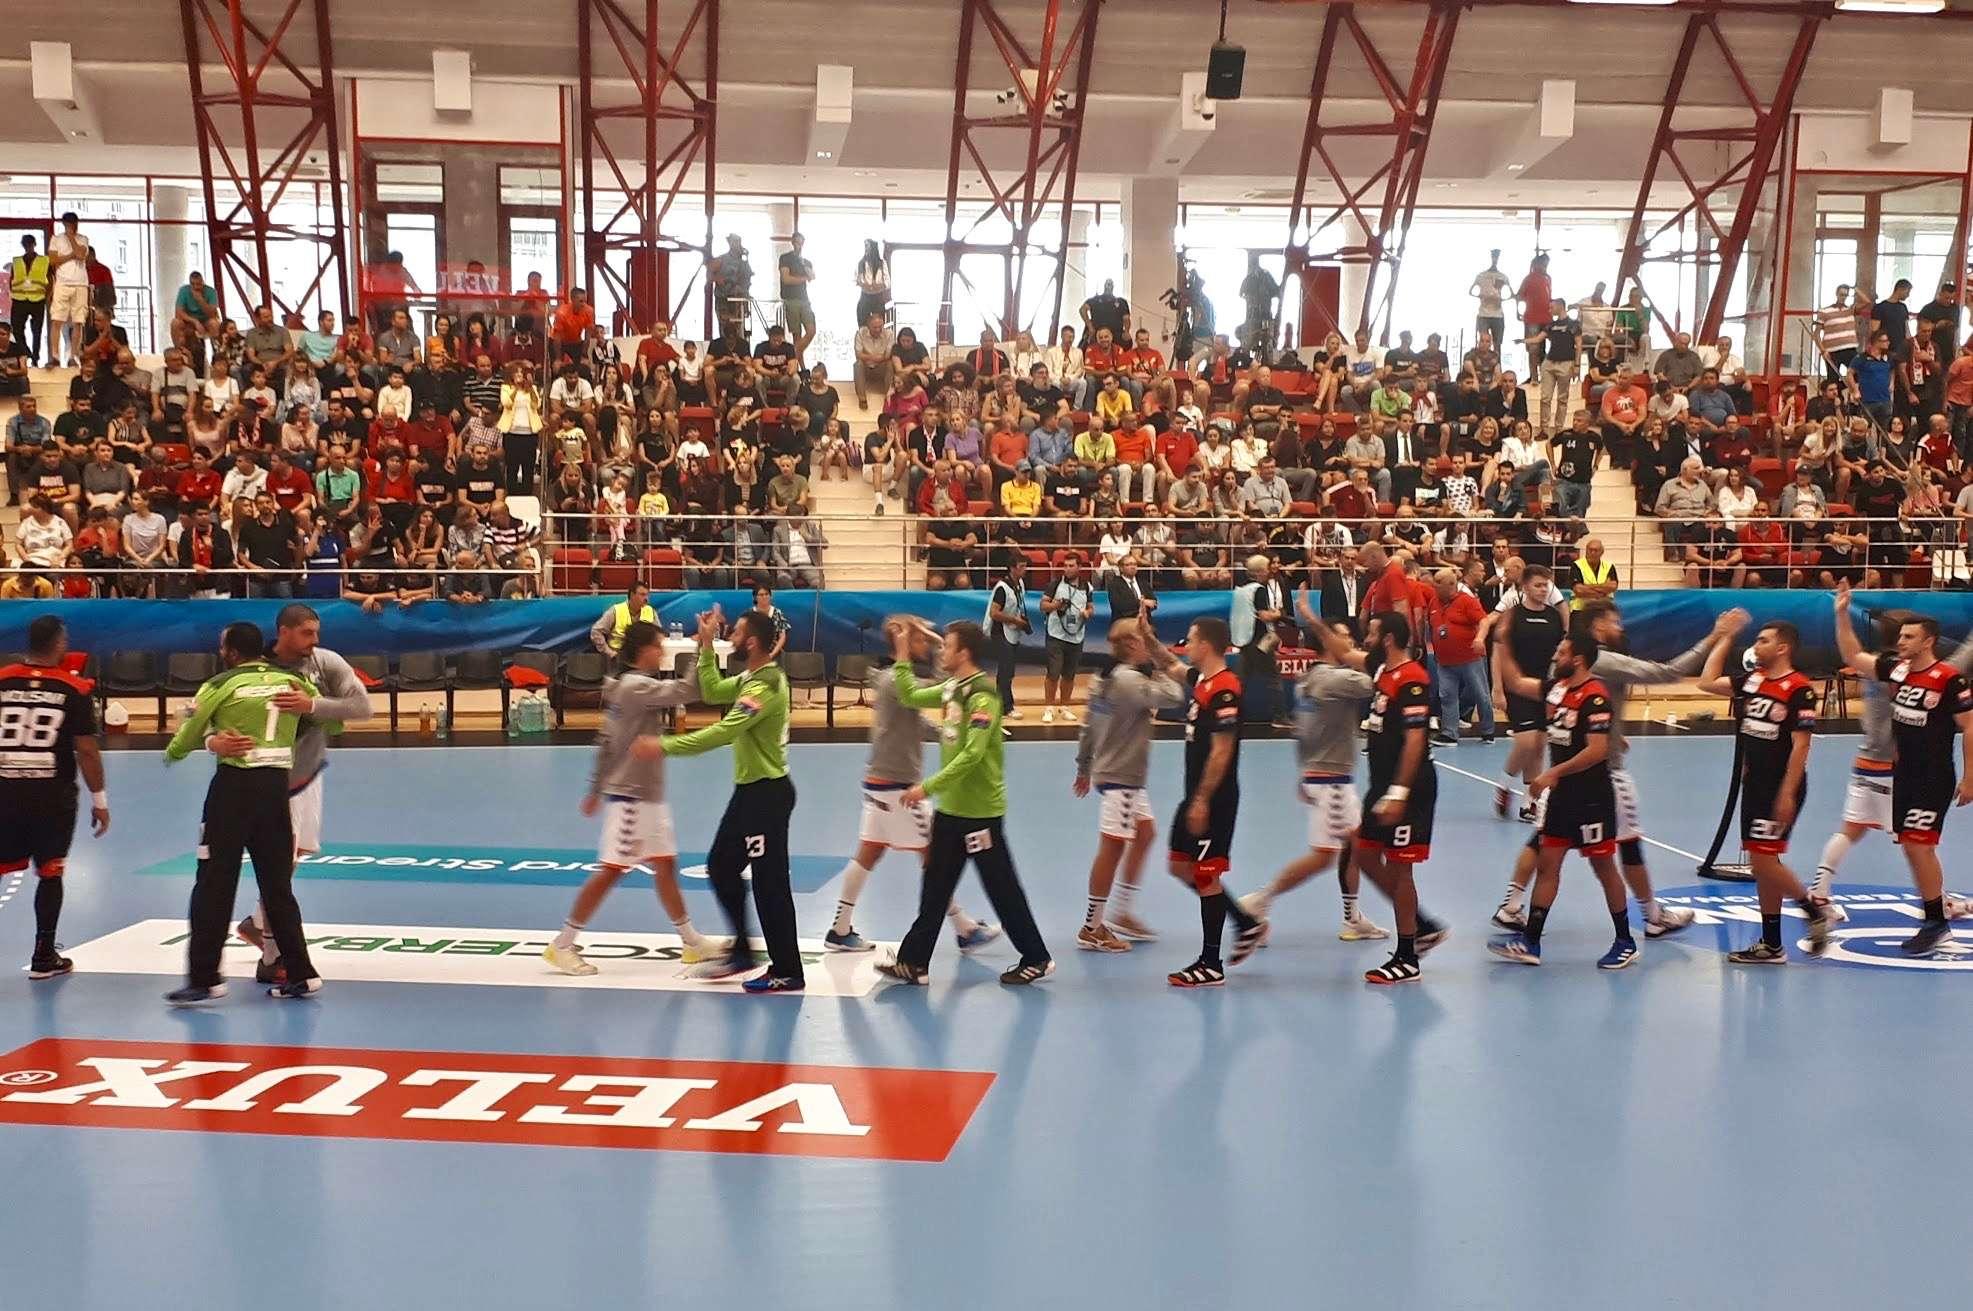 On-the-Ground Coverage: The Dinamo Bucuresti vs. IFK Kristianstad Handball Match